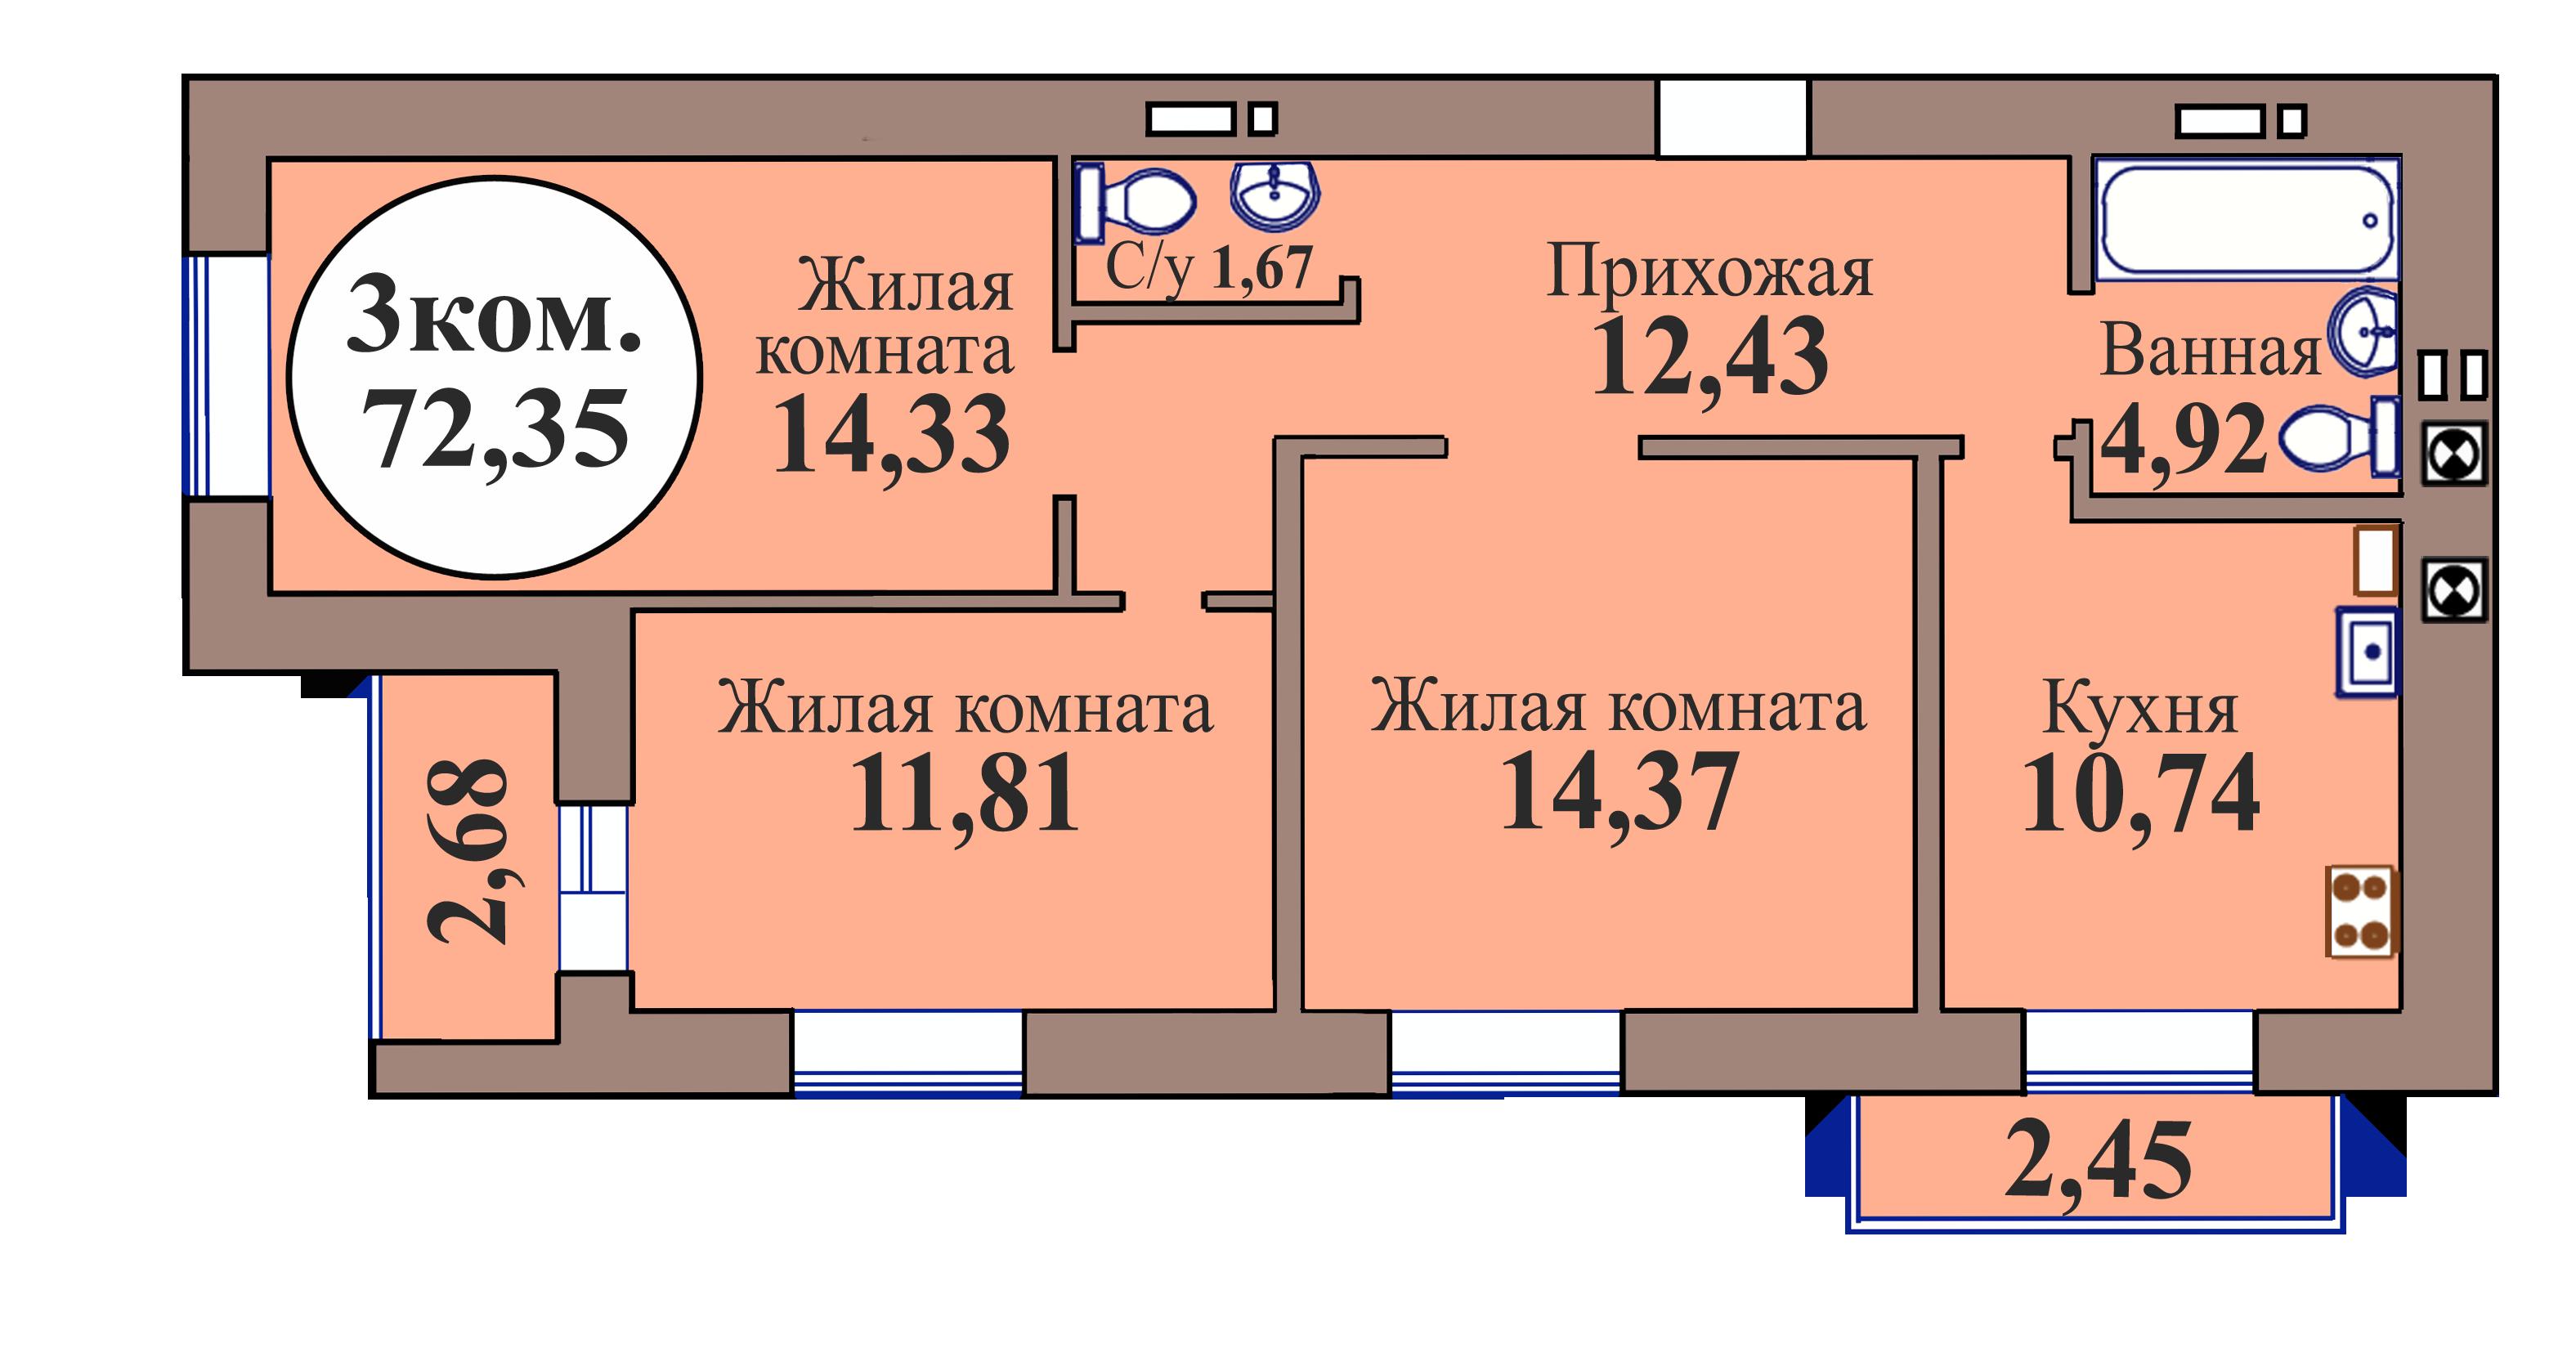 3-комн. кв. по пер. Калининградский, 5 кв. 194 в Калининграде